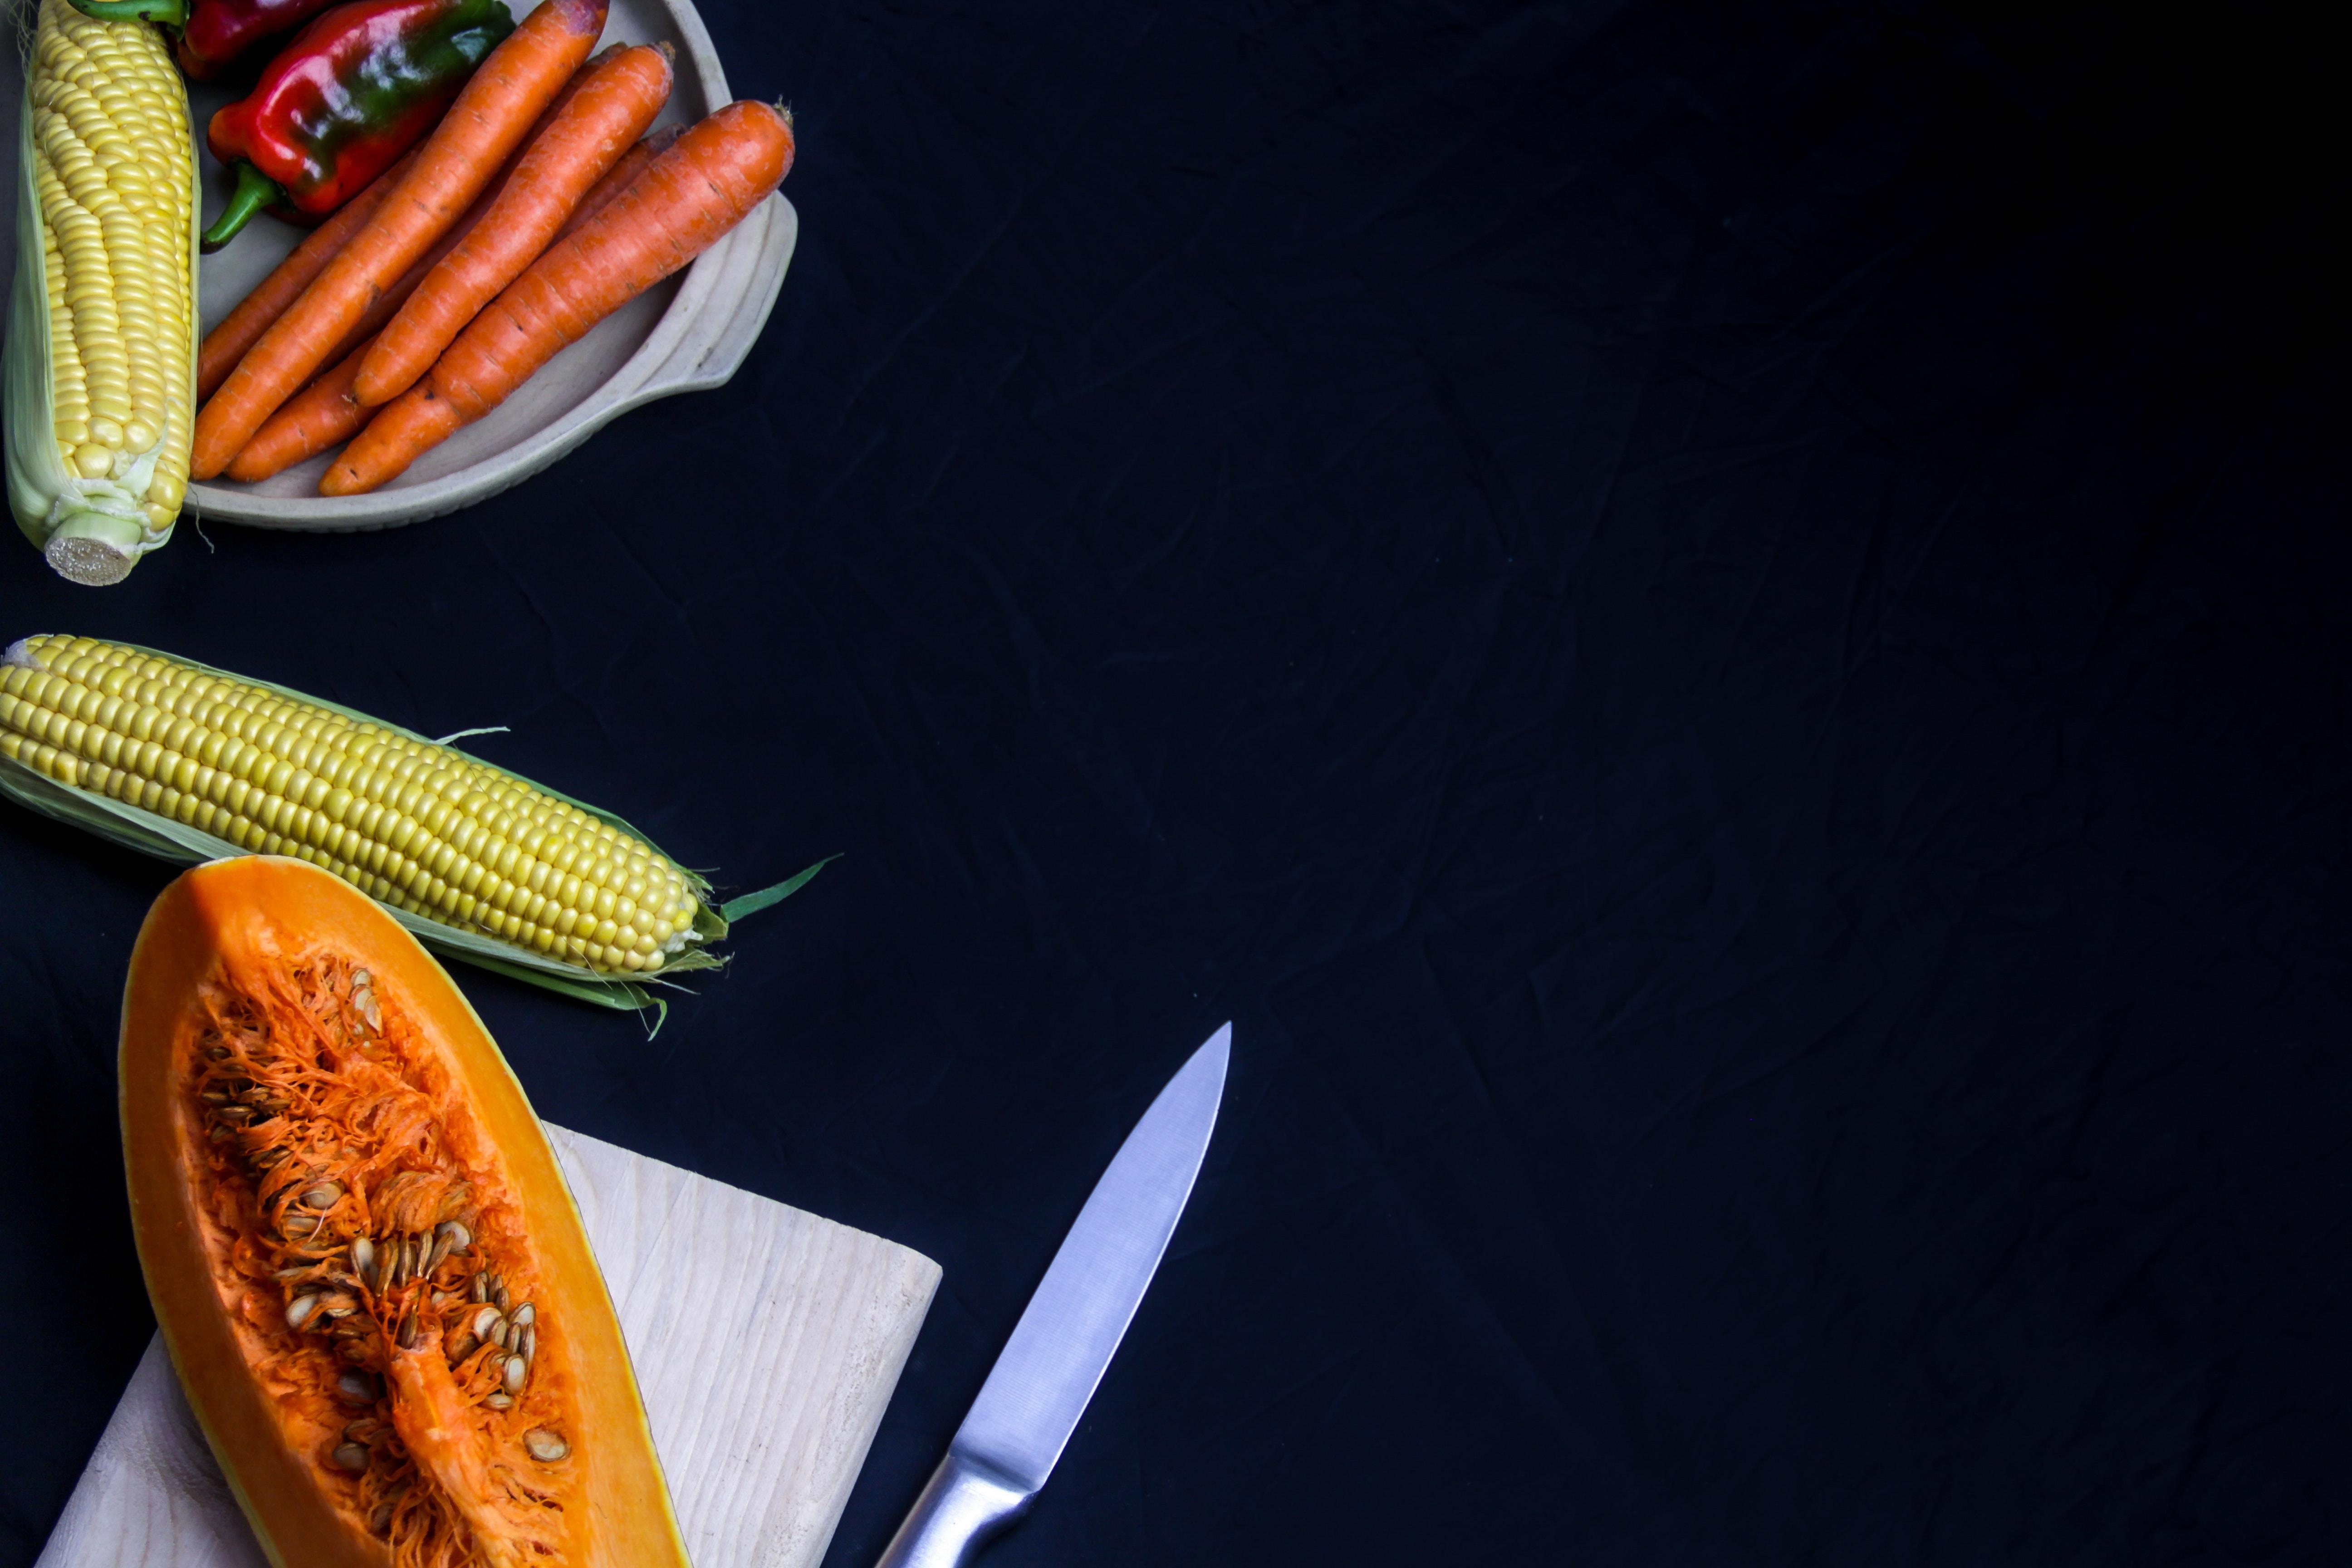 A flat lay shot of a knife, sweetcorns, pumpkins, carrots and various vegetables.